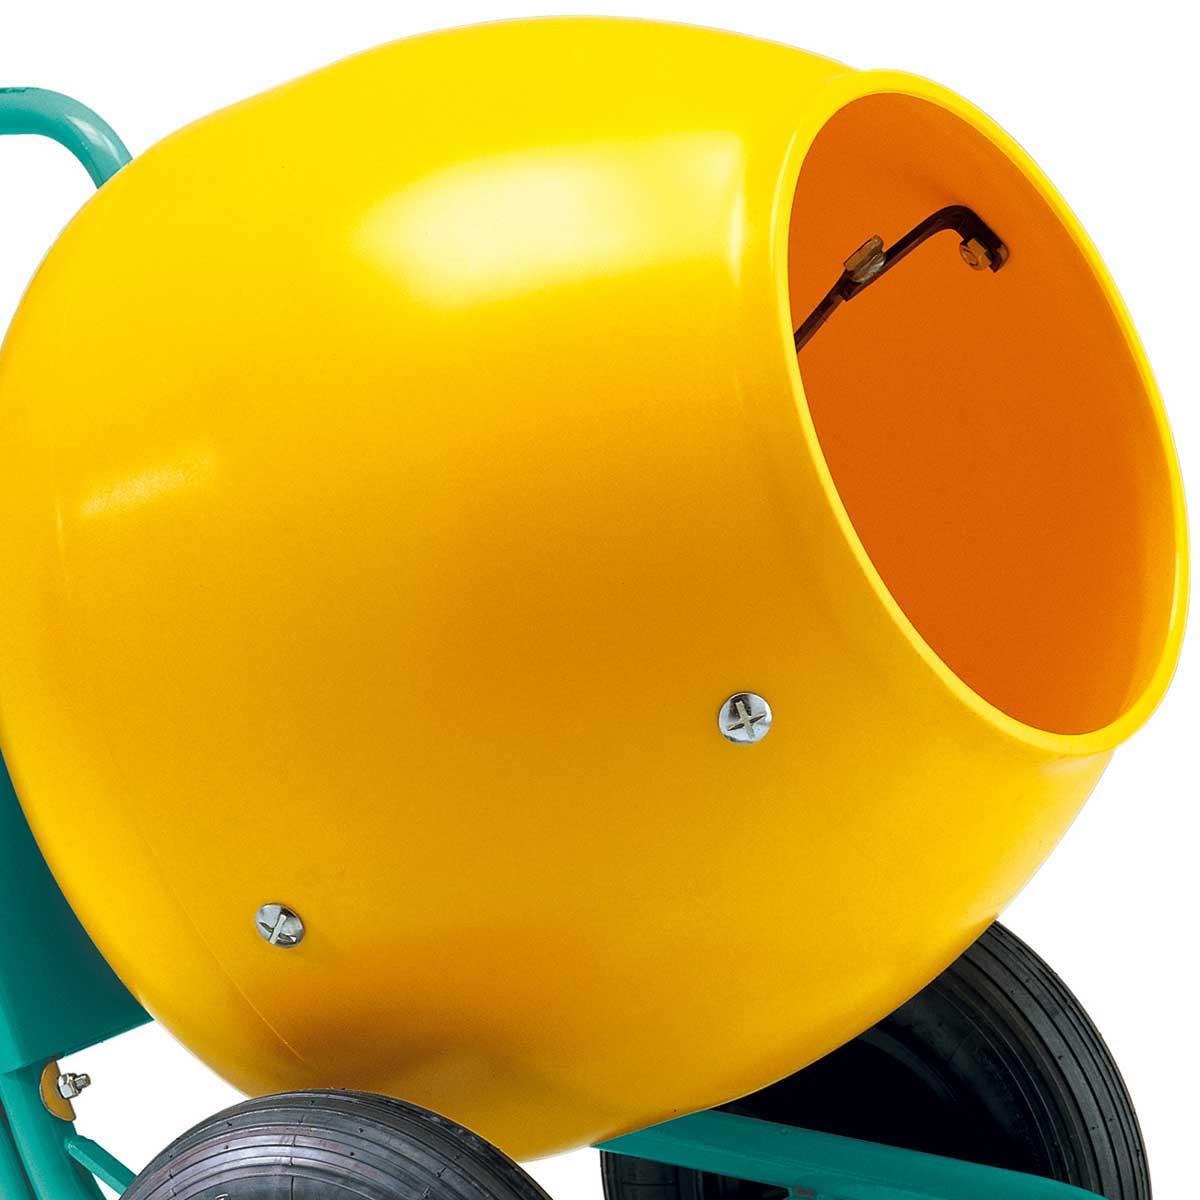 Imer Wheelman Concrete Mixer drum